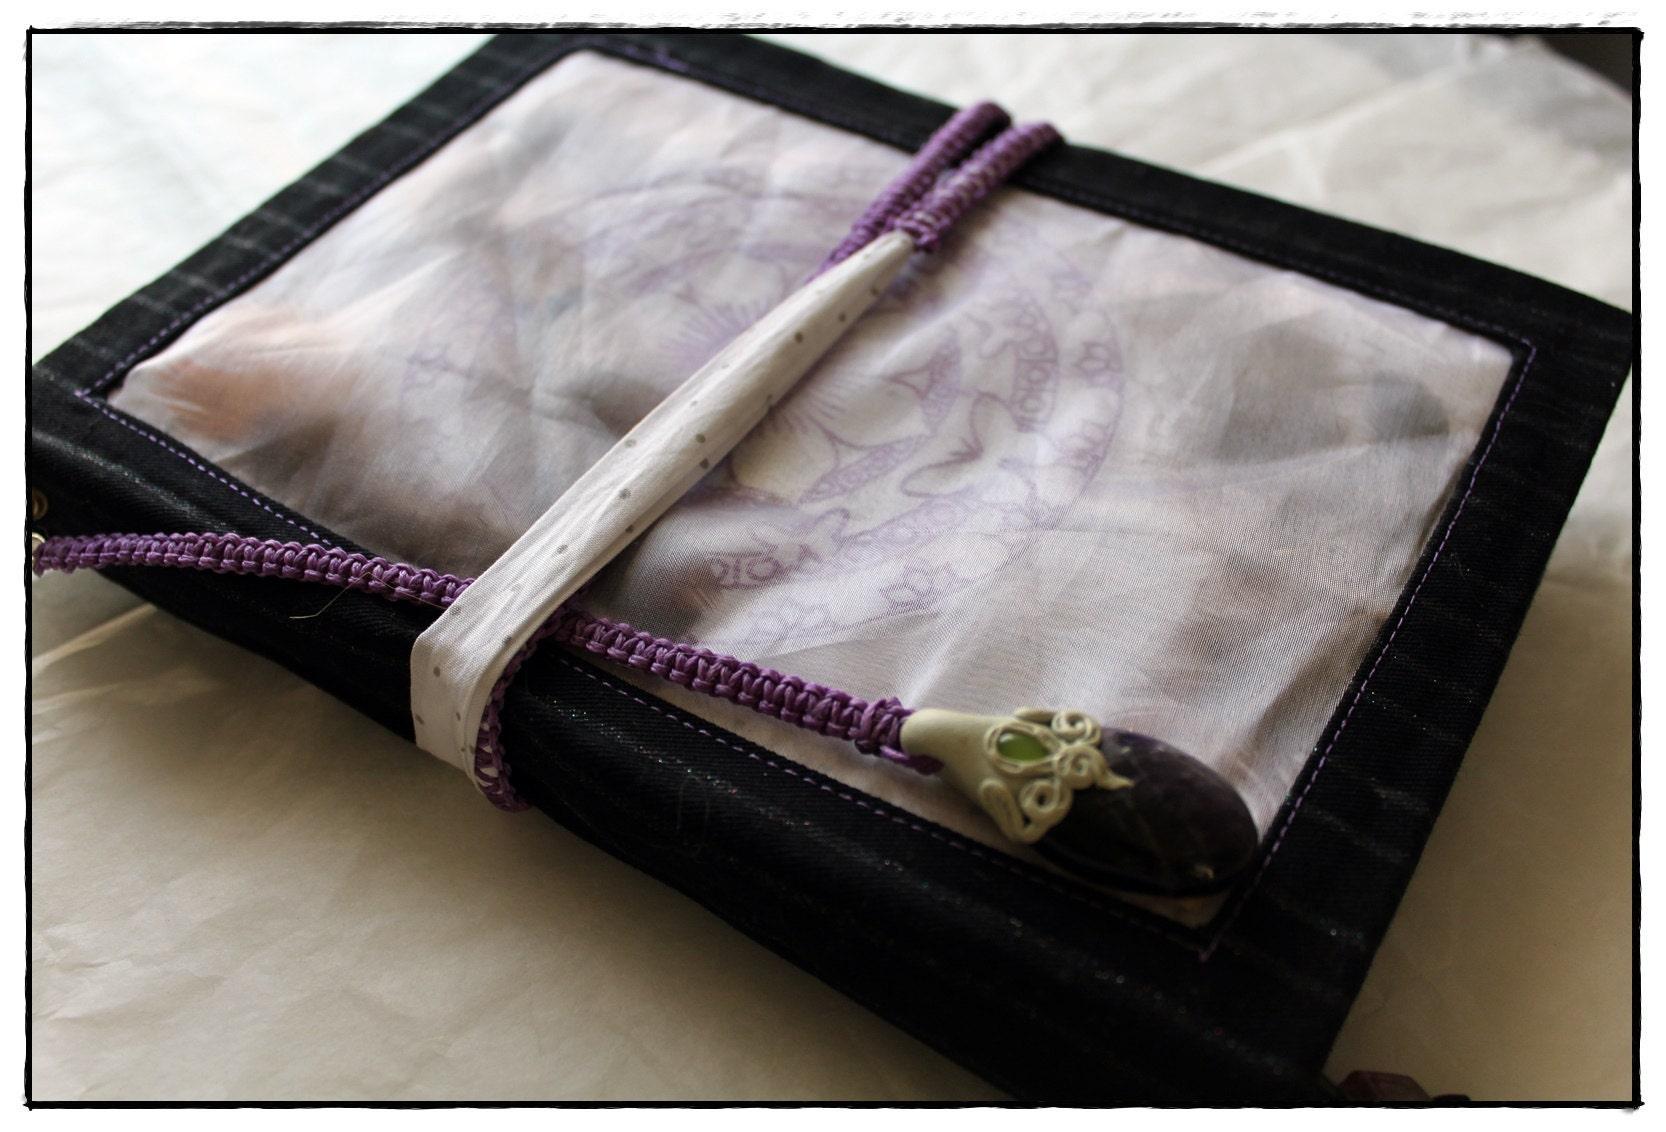 Amethyste, attrape rêve, carnet artisanal, lithotherapy, handmade notebook, bullet journal, plusmes, mandala